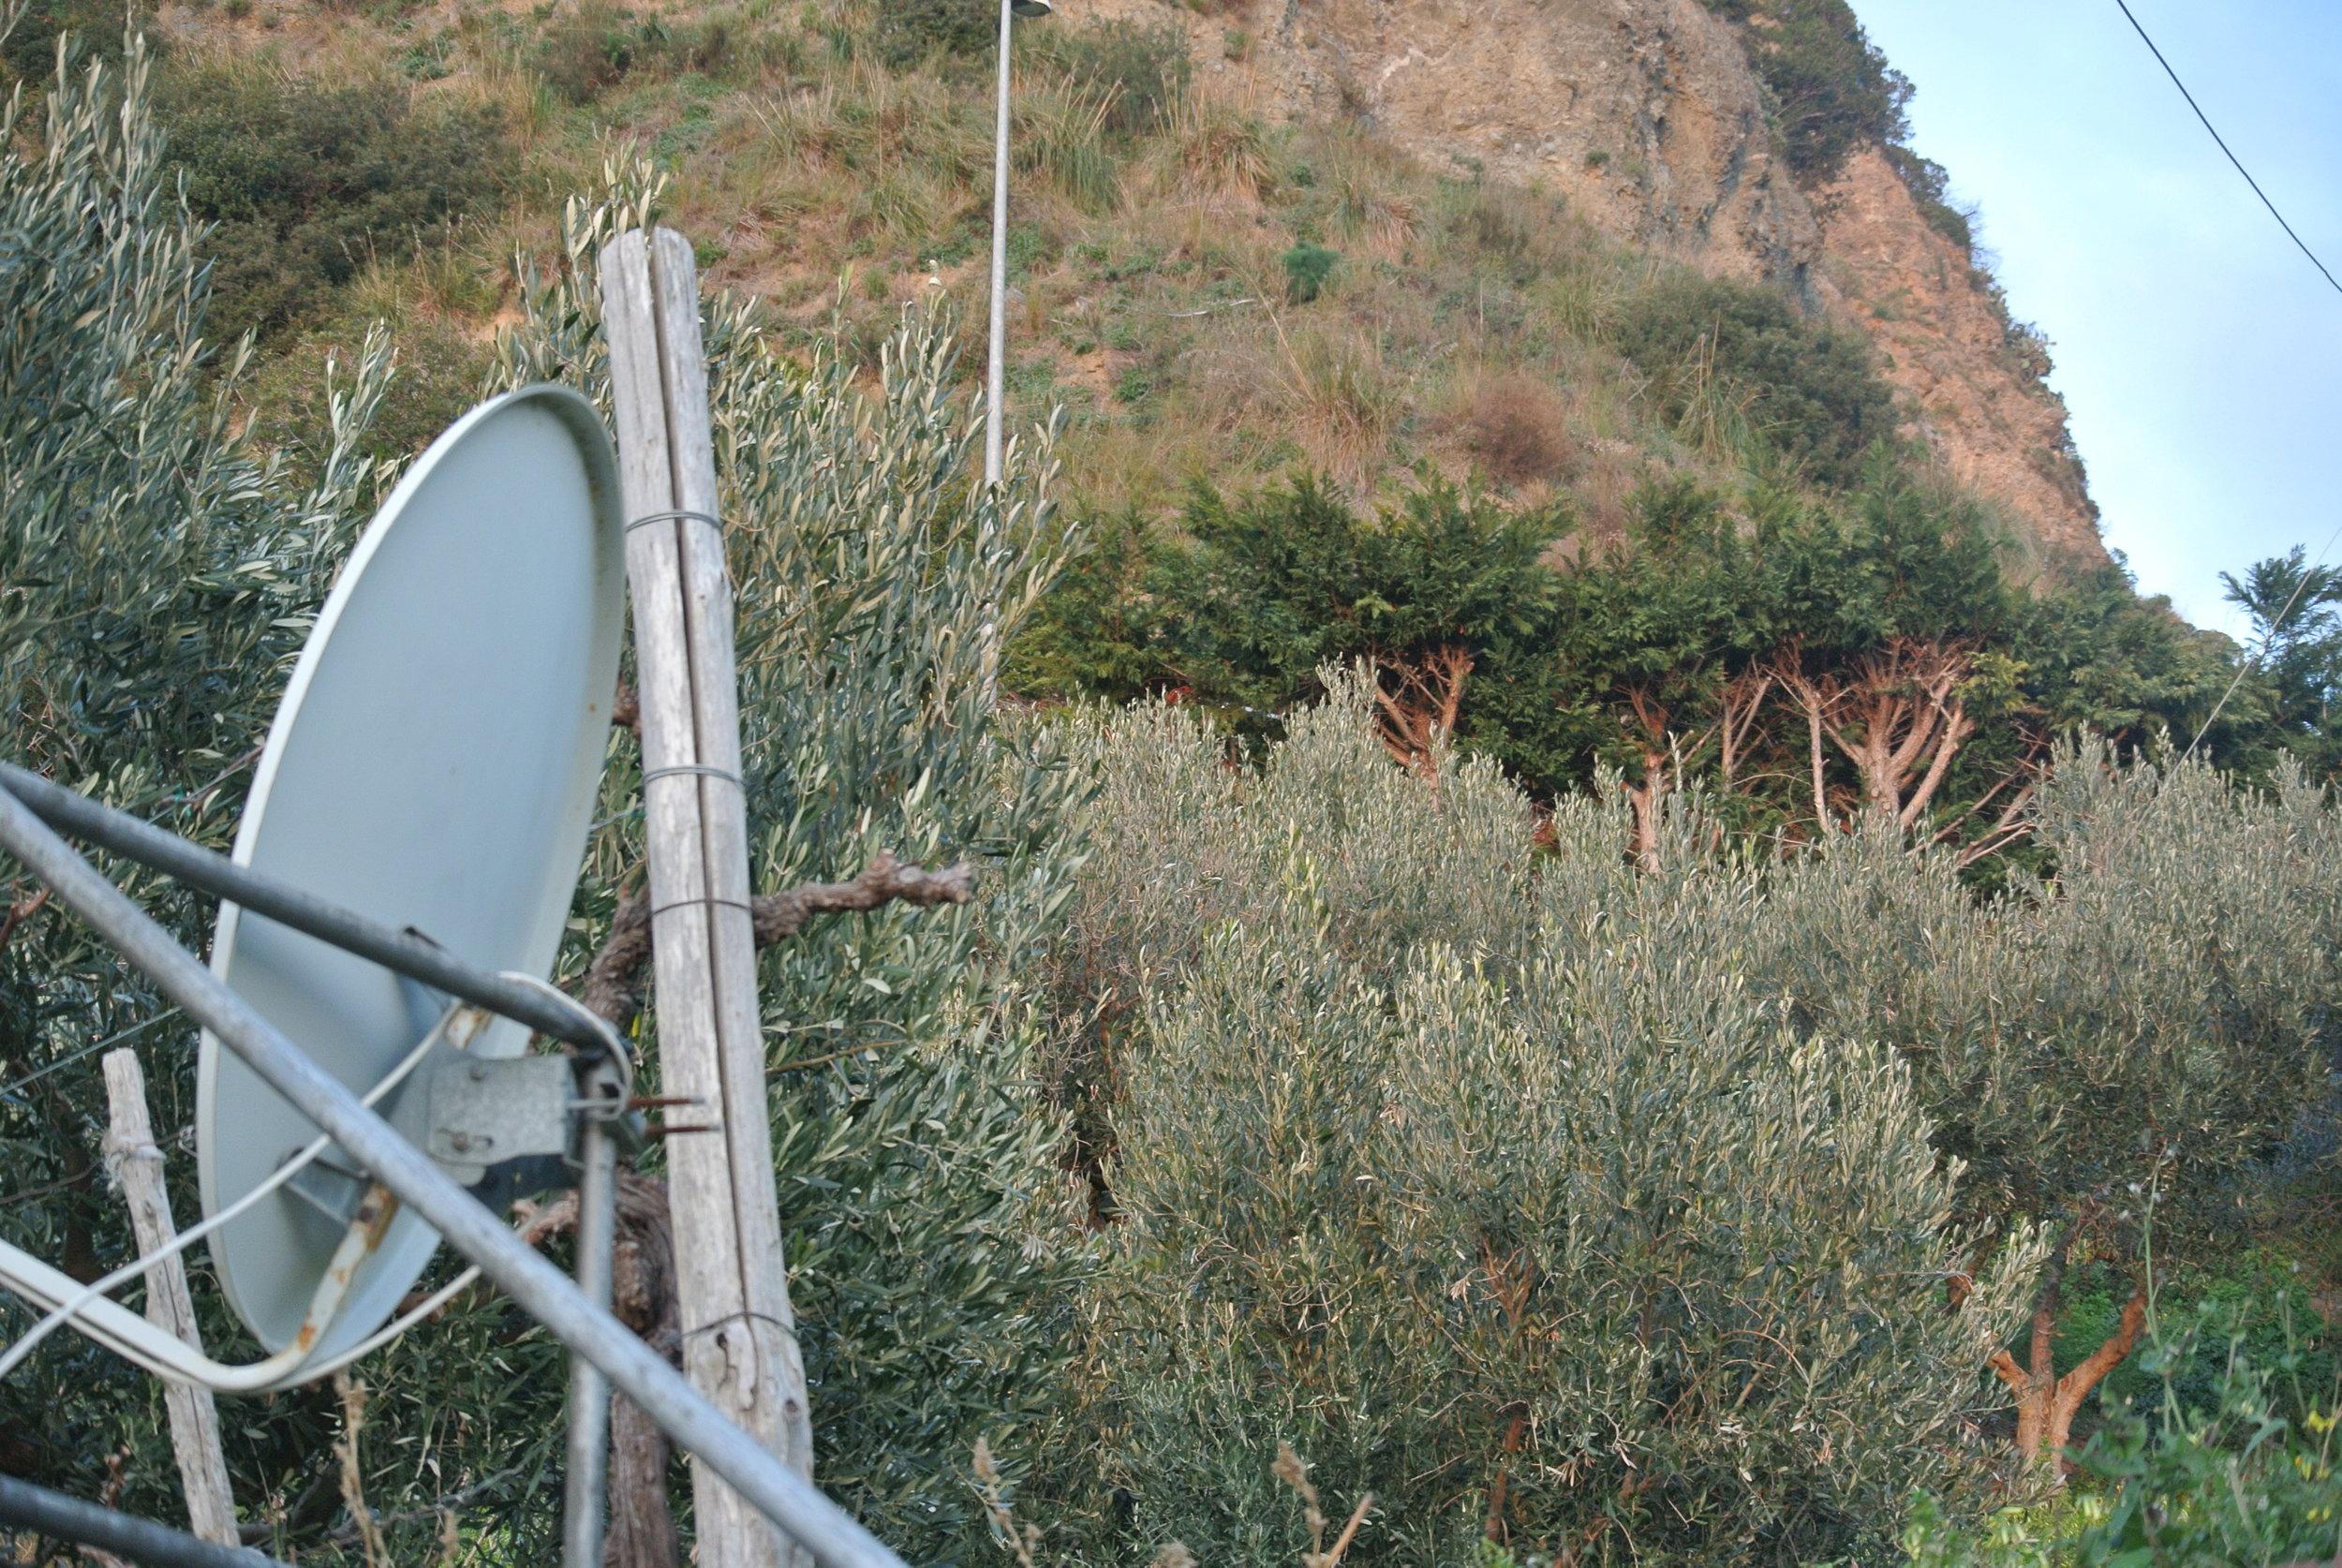 The hills surrounding. Longobardi, Italy; 19 February 2019. ©Pamela Kerpius